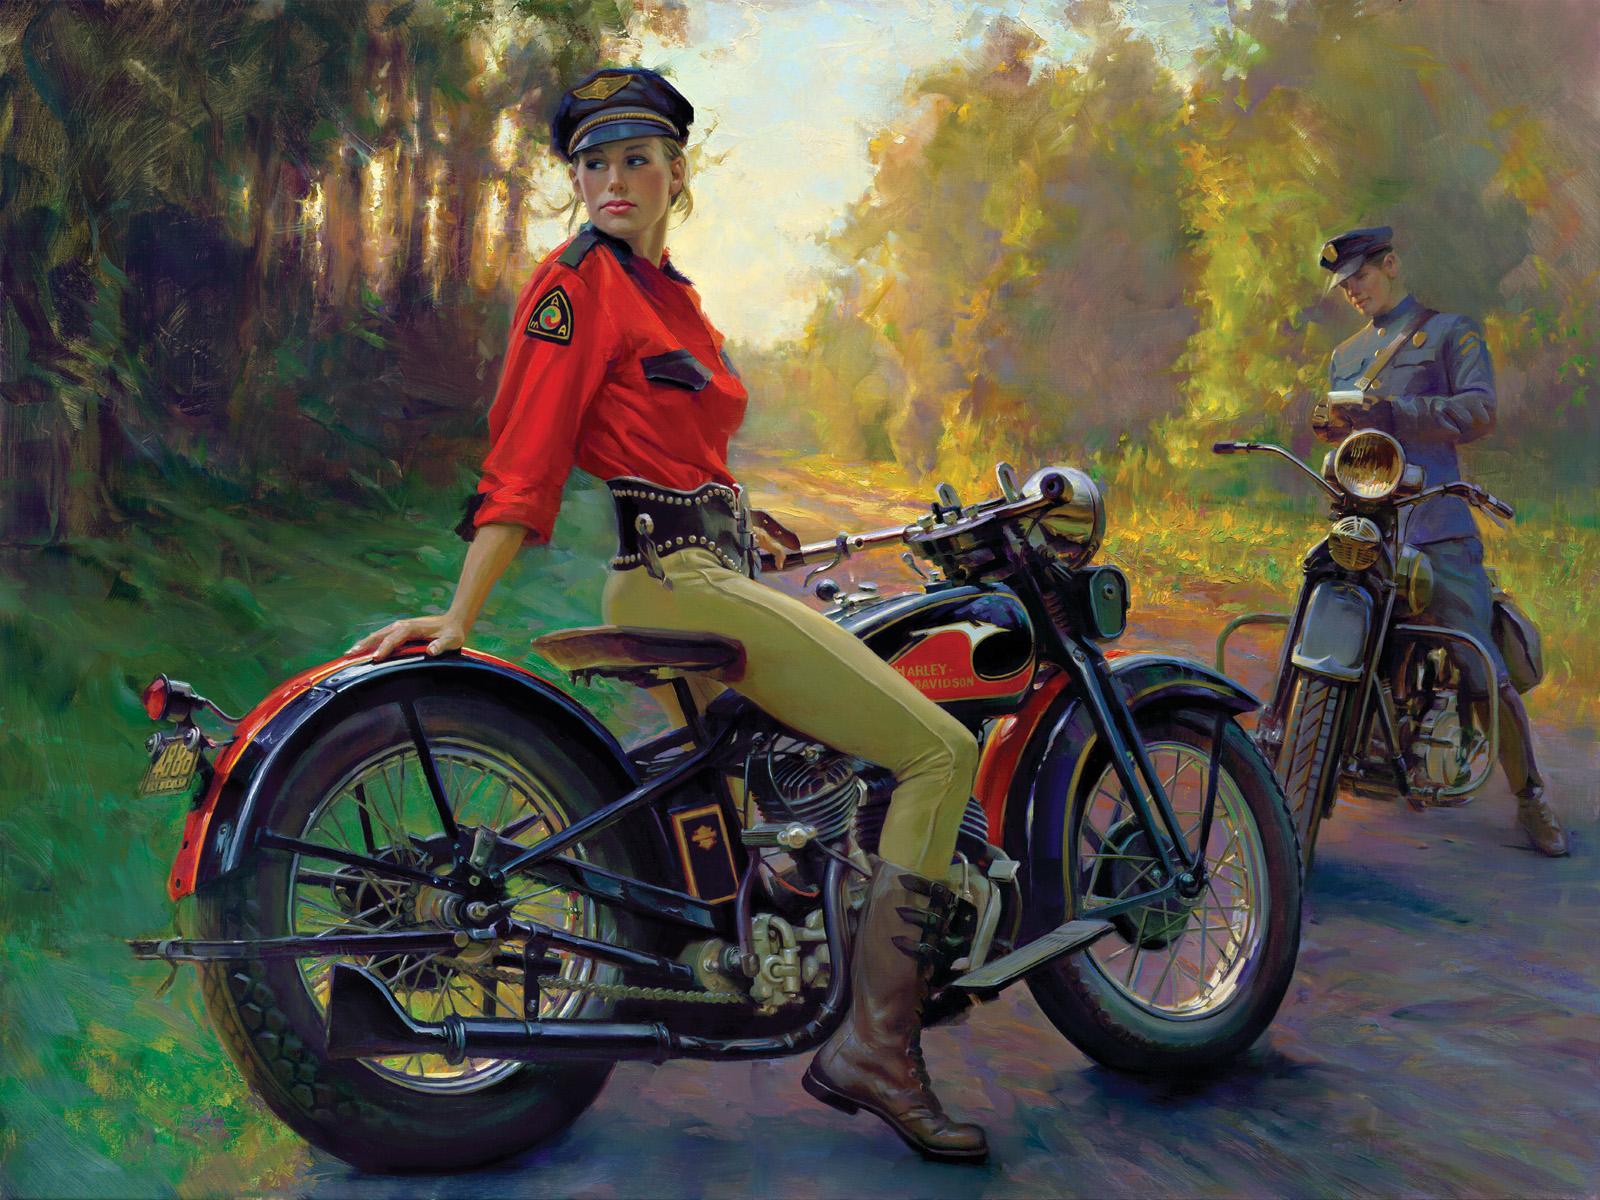 4e0076bafe9e9 David Uhl s Retro Motorcycling Woman Art – Moto Lady